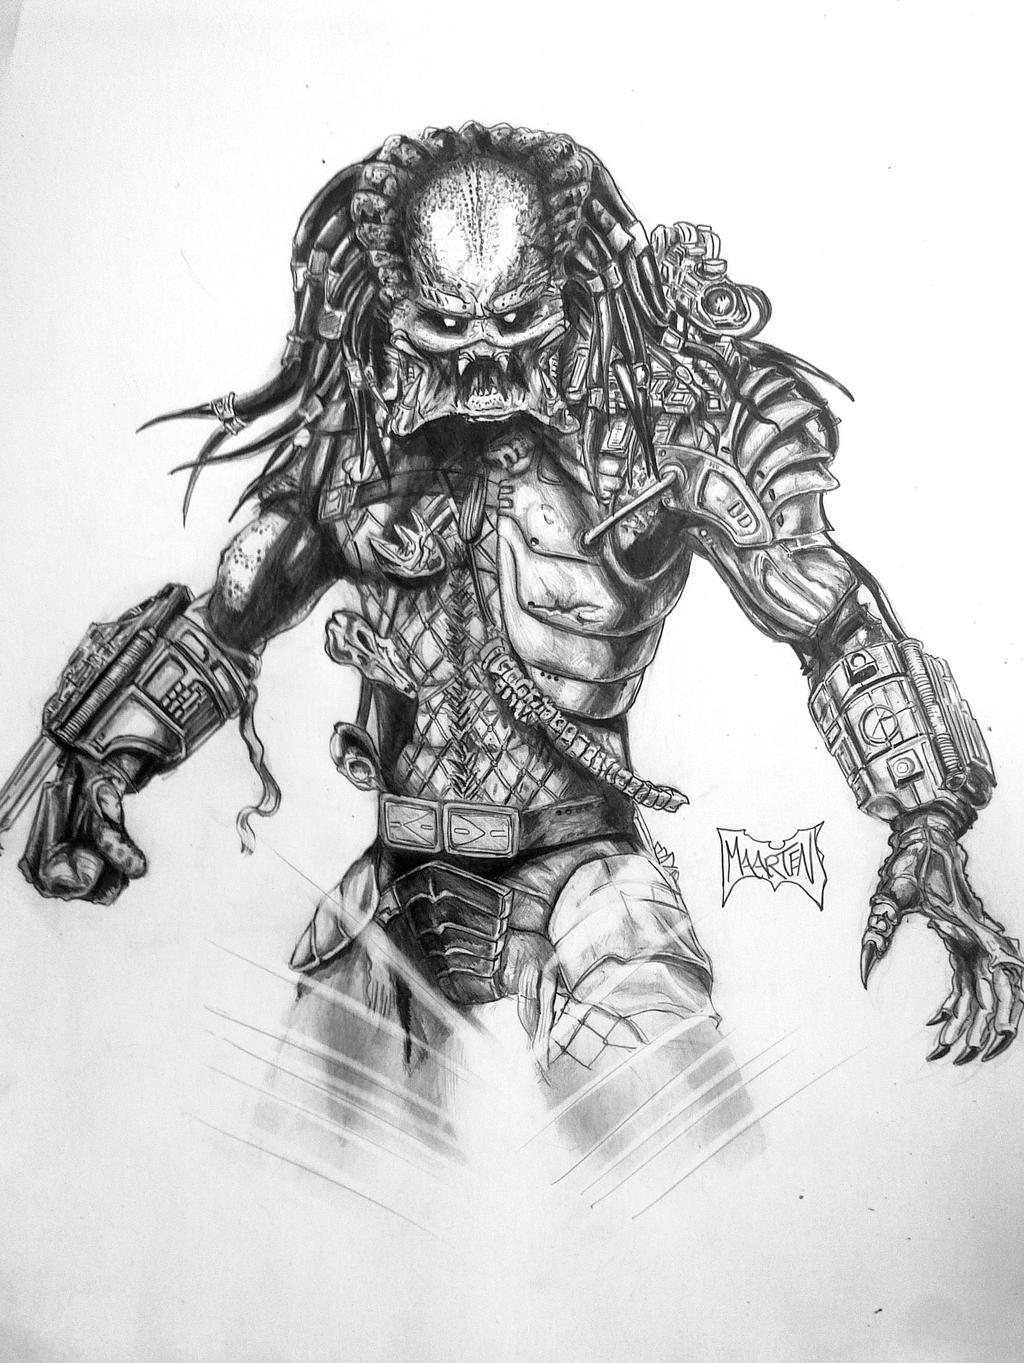 aliens vs predator drawings - photo #35